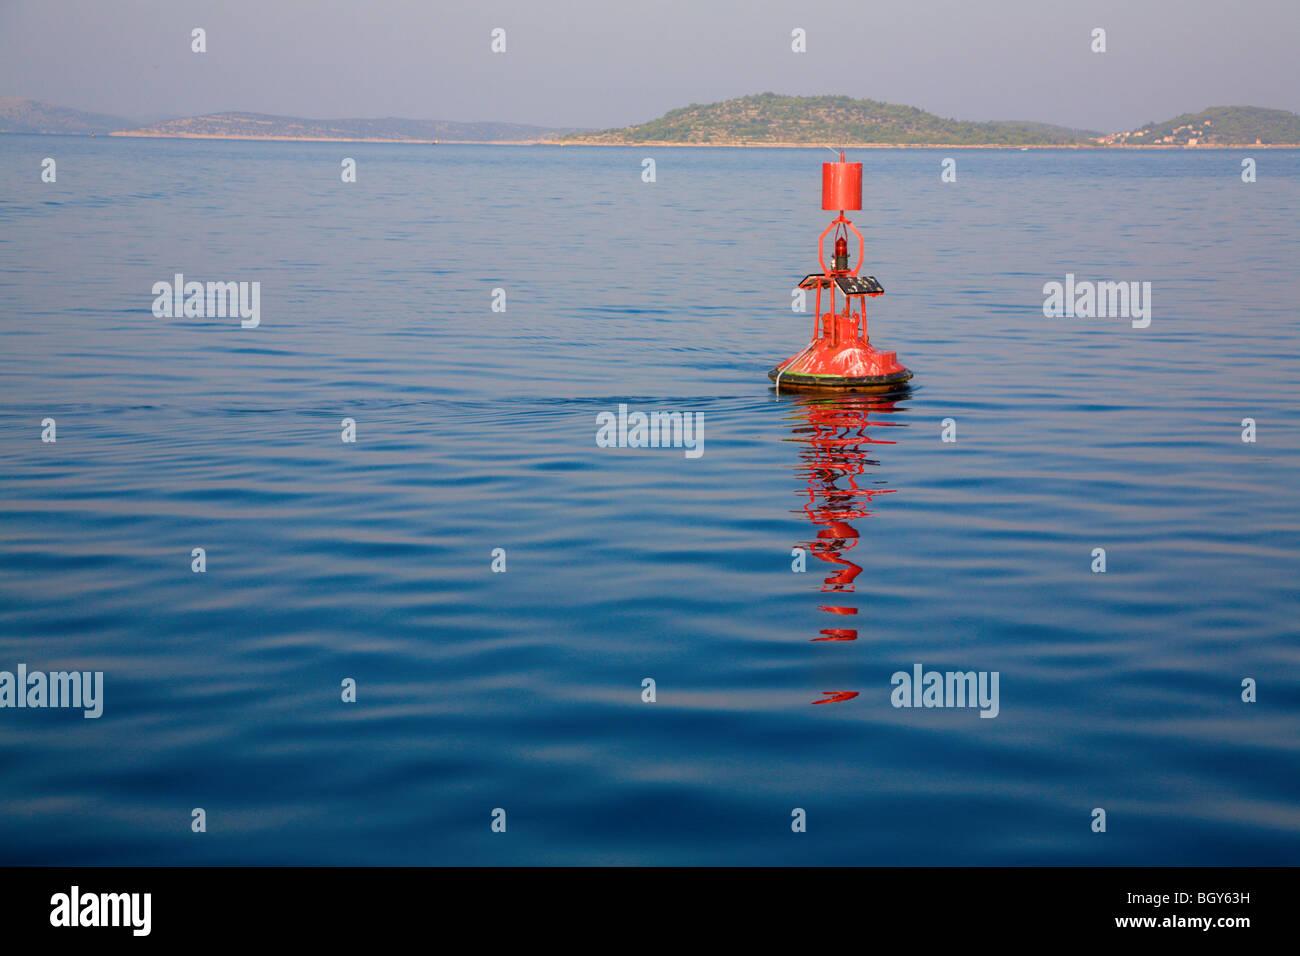 Buoy - Stock Image